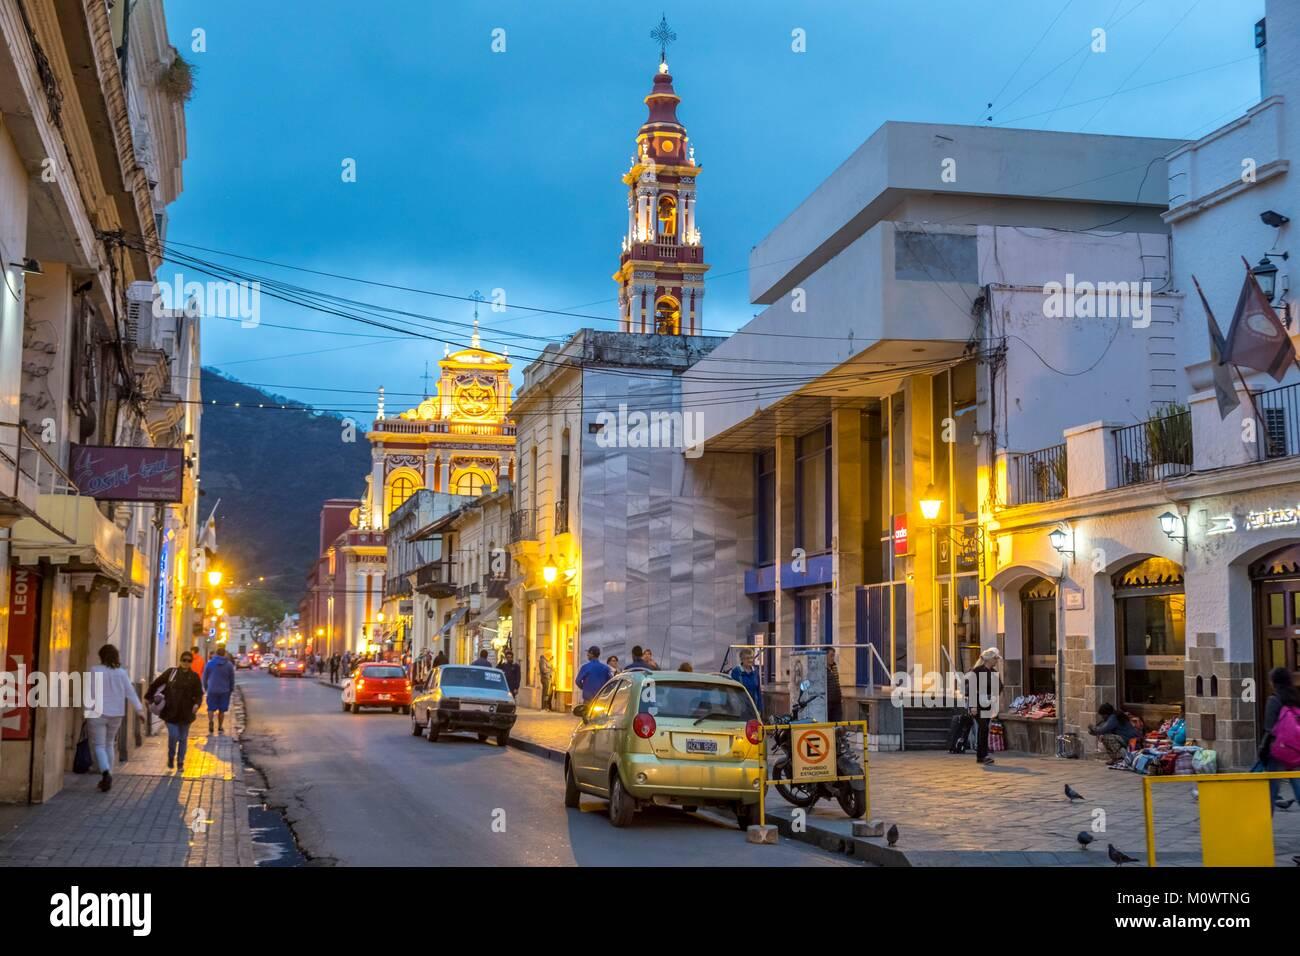 L'Argentine, la province de Salta, Salta, San Francisco church Photo Stock